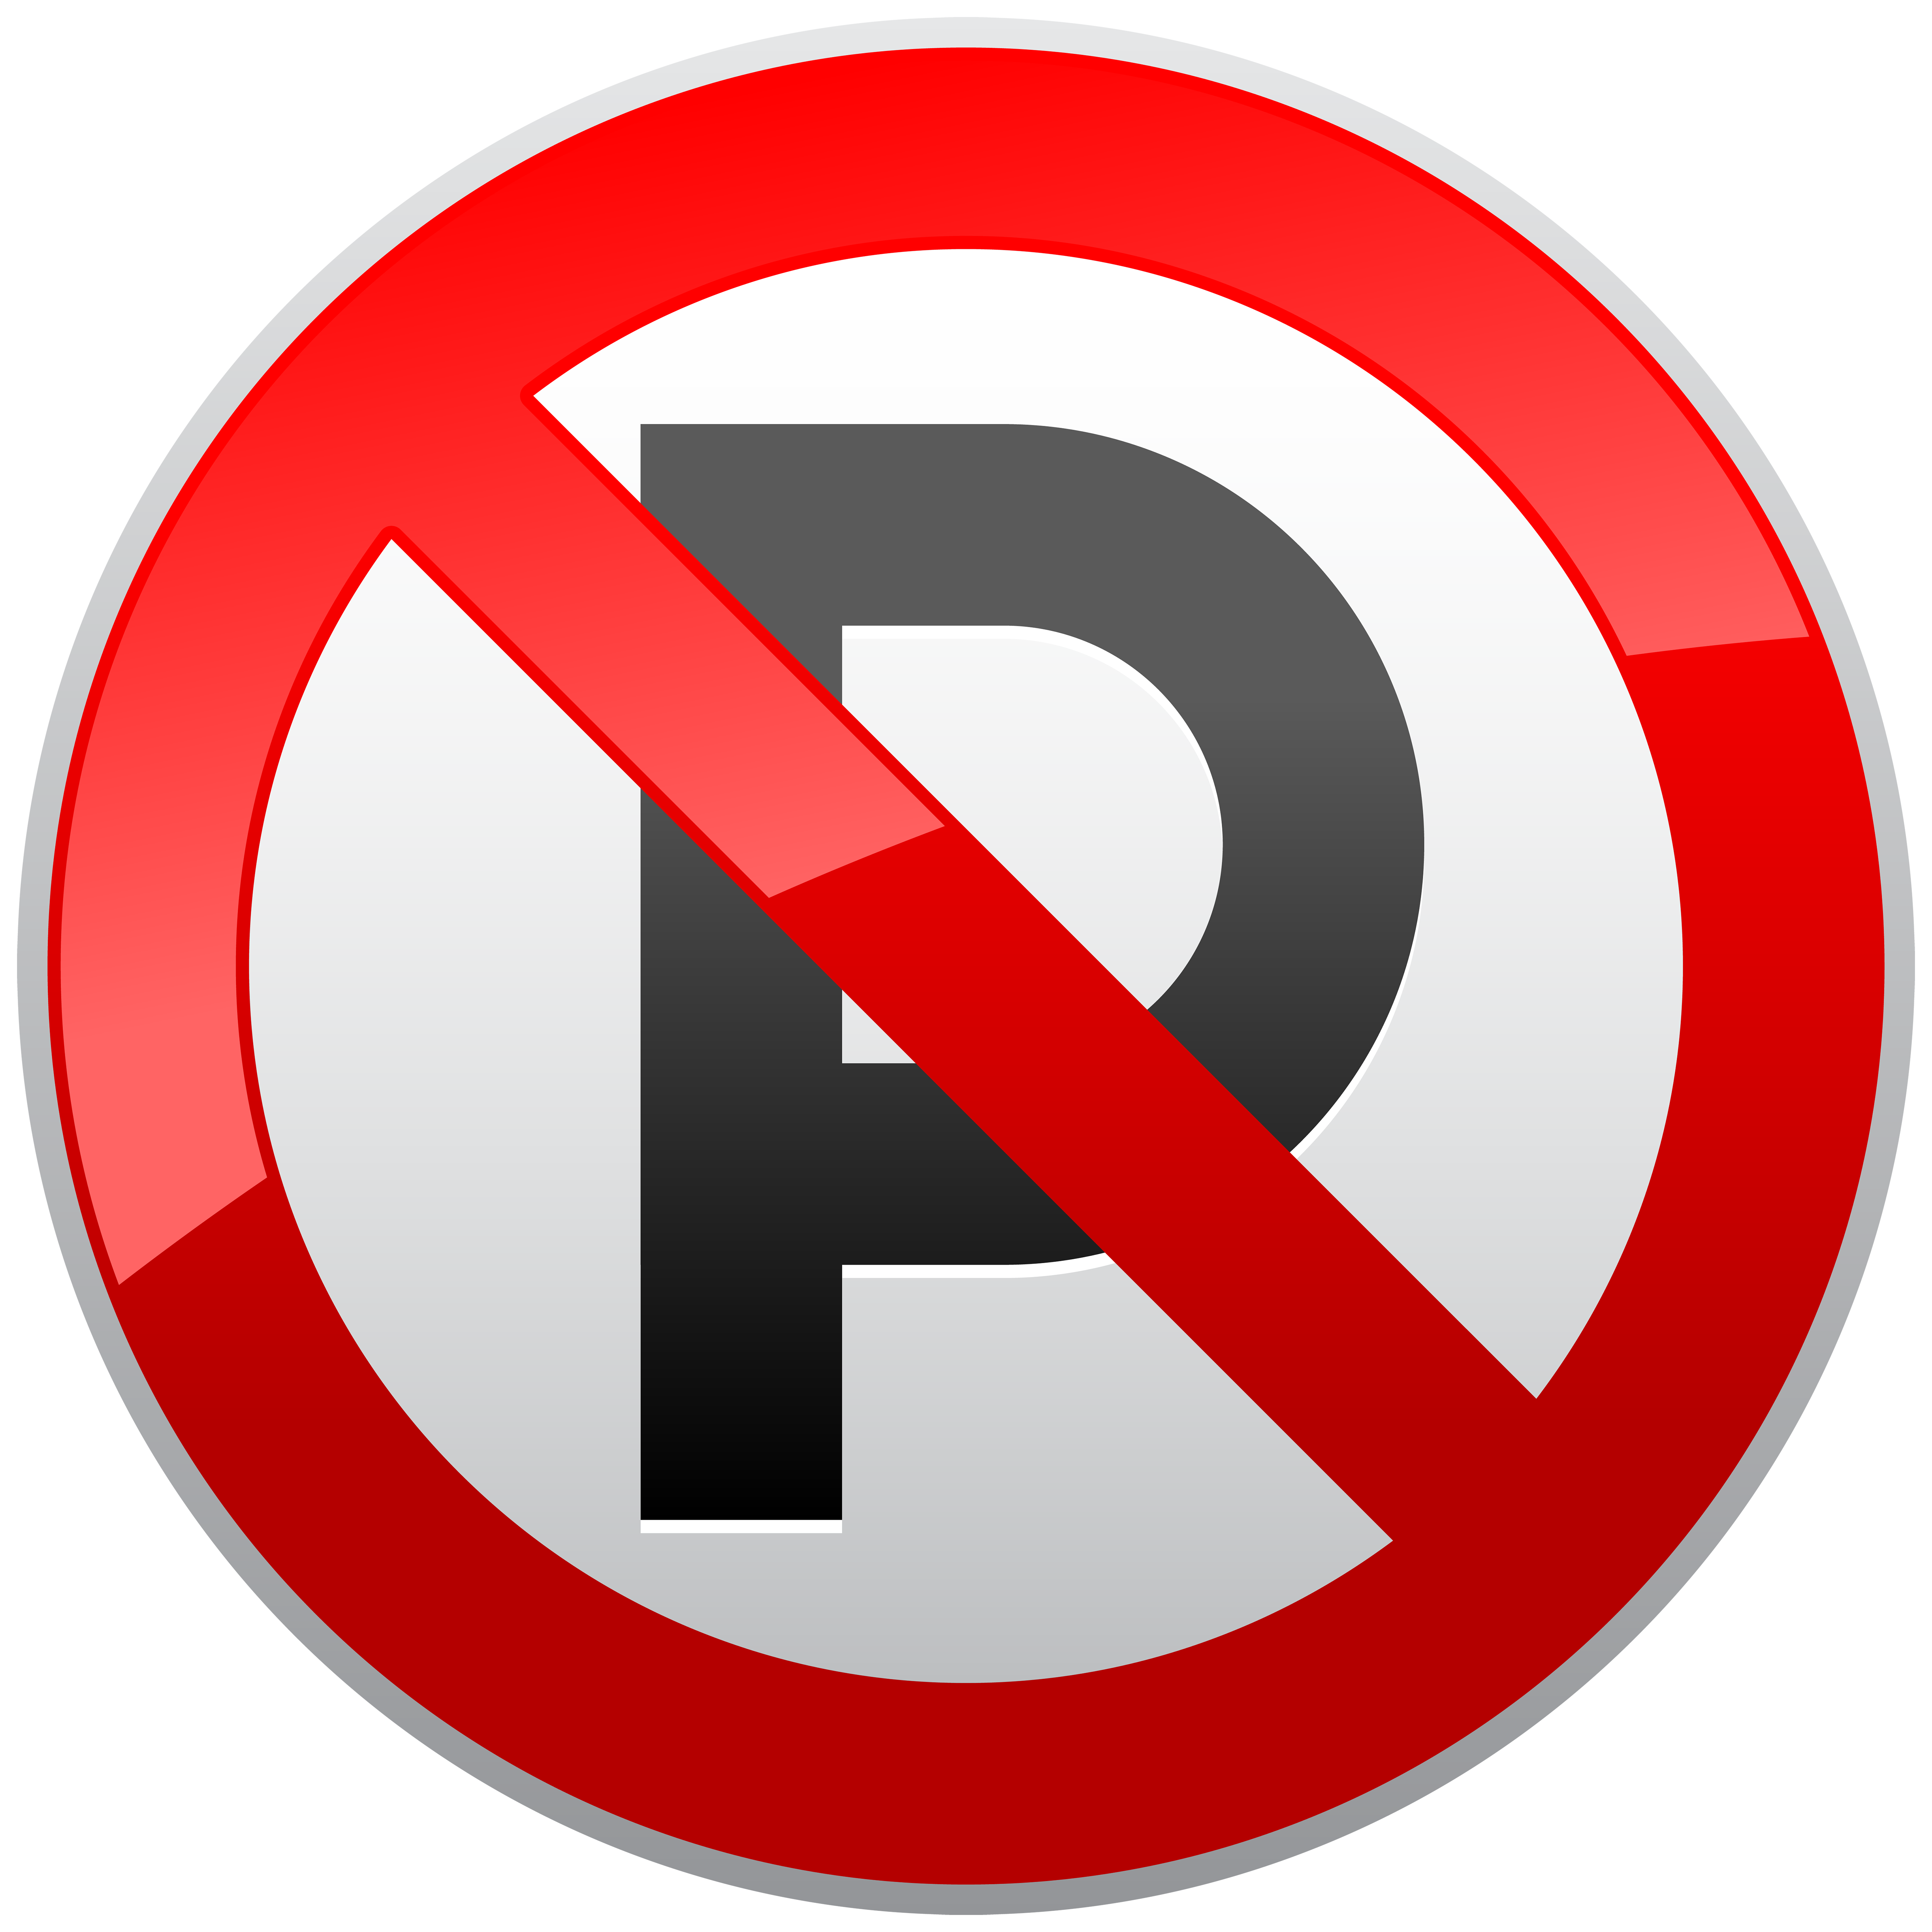 No Parking Prohibition Sign PNG Clipart.